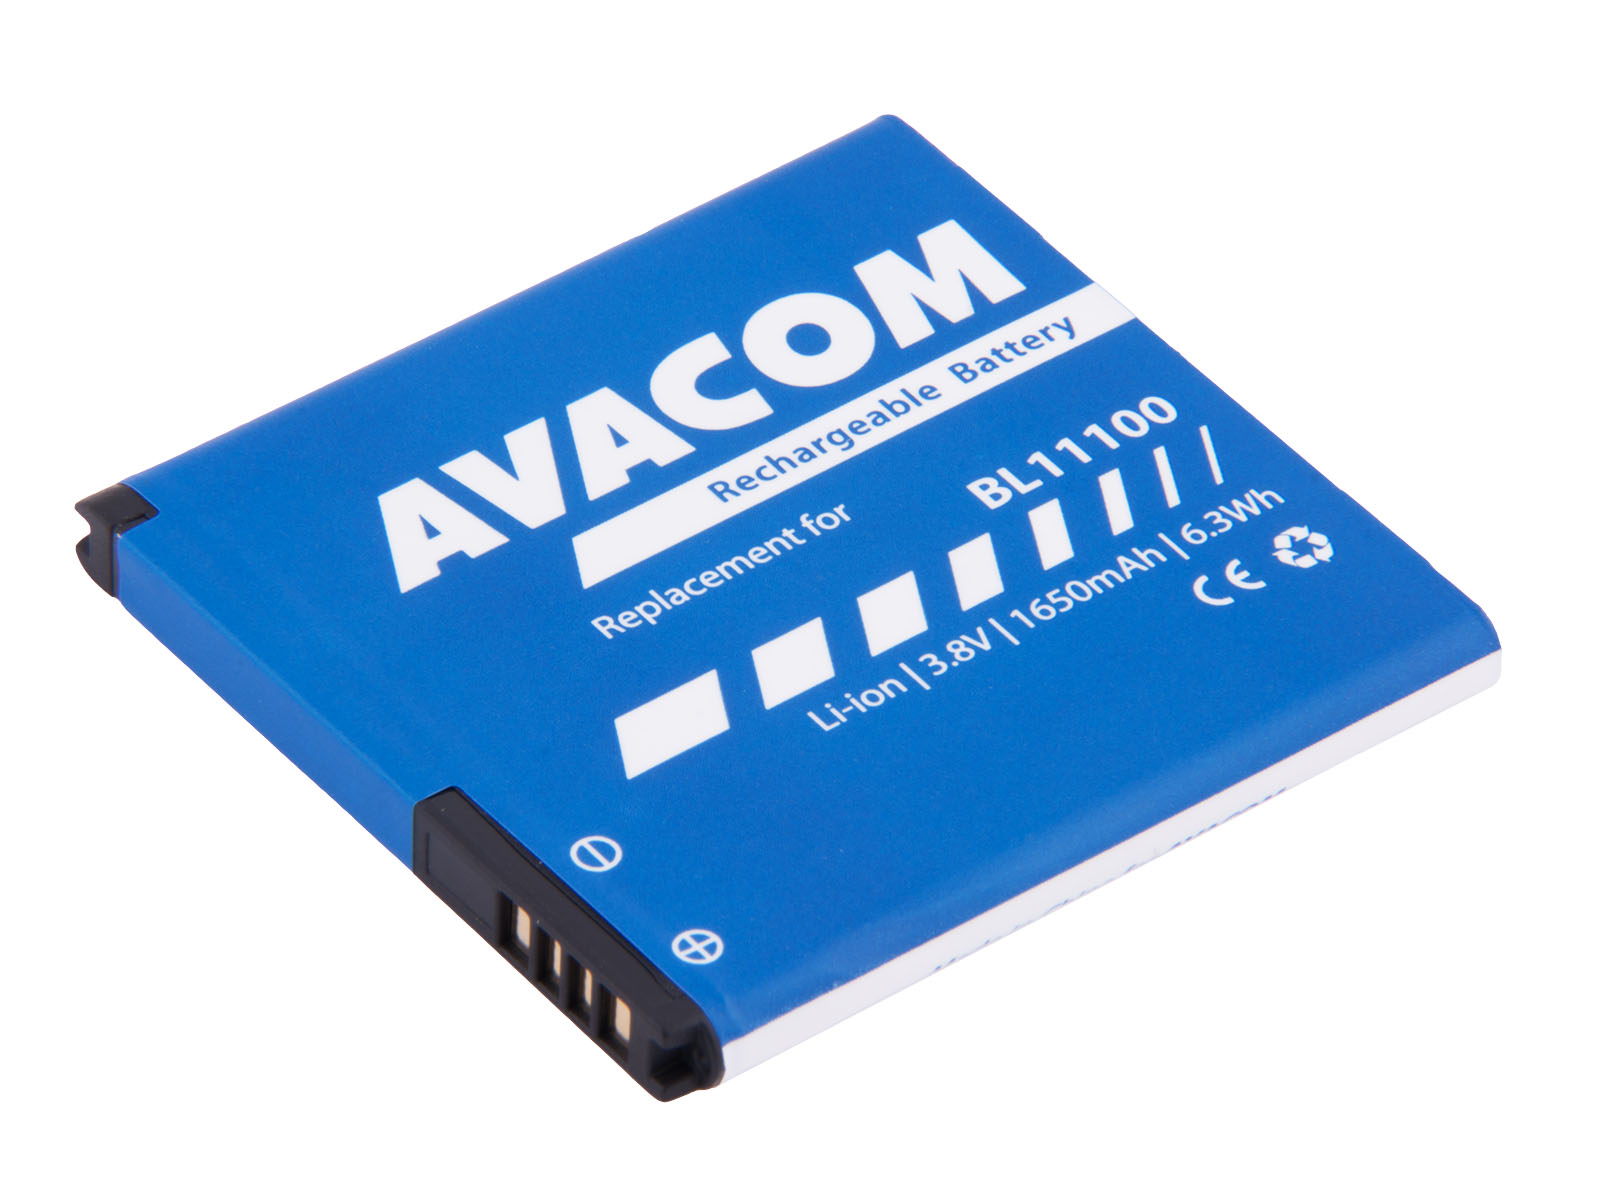 Baterie AVACOM PDHT-DESX-S1650 do mobilu HTC Desire X Li-Ion 3,7V 1200mAh